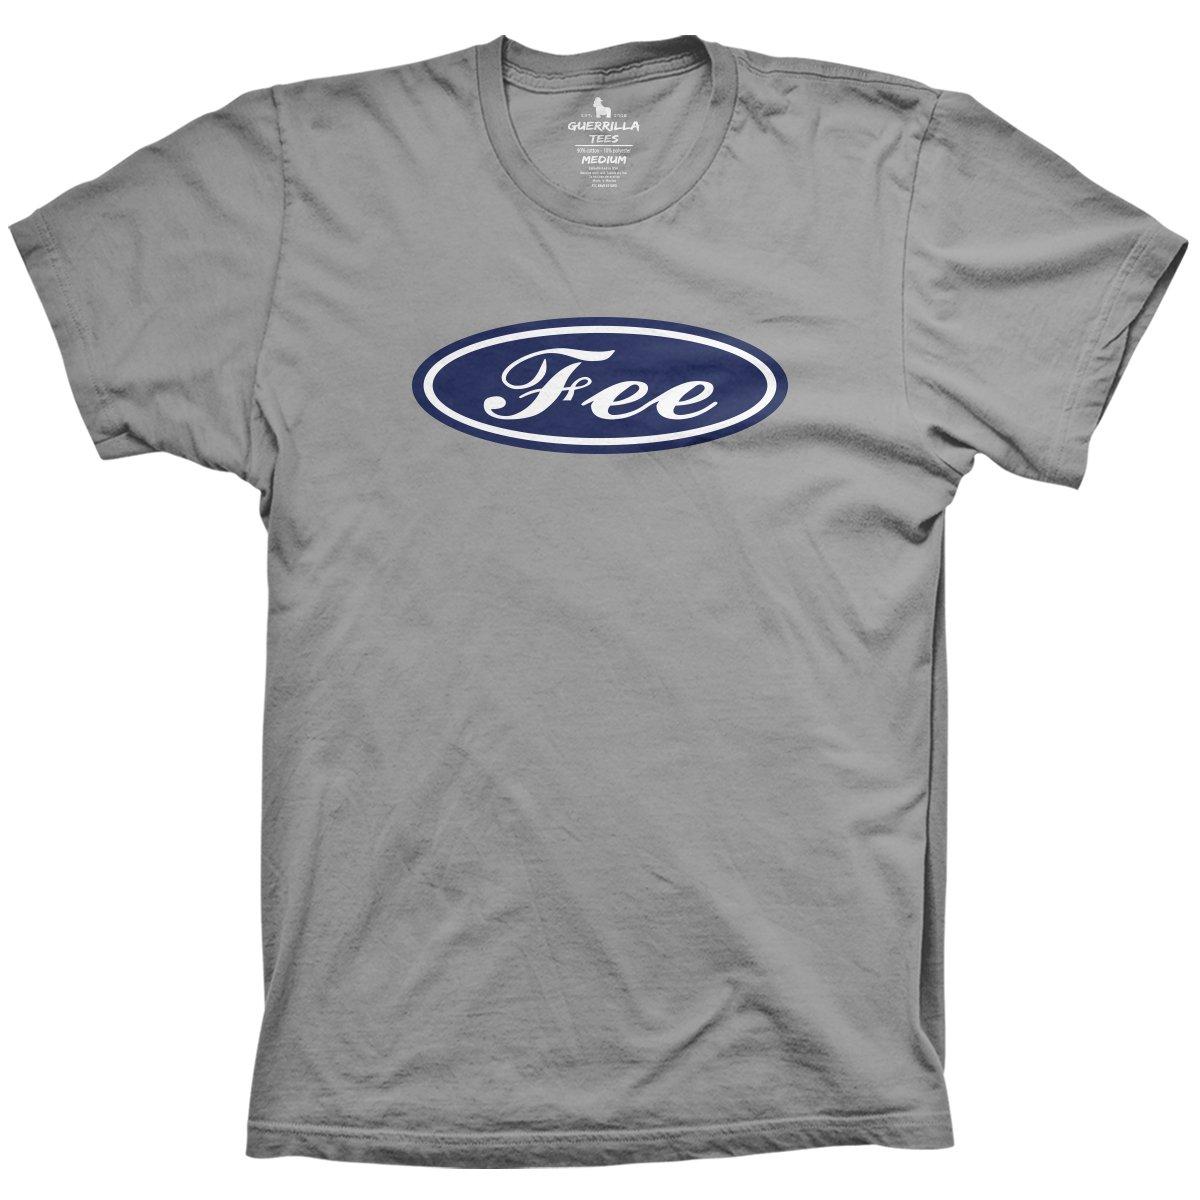 Phish Fee T-Shirt